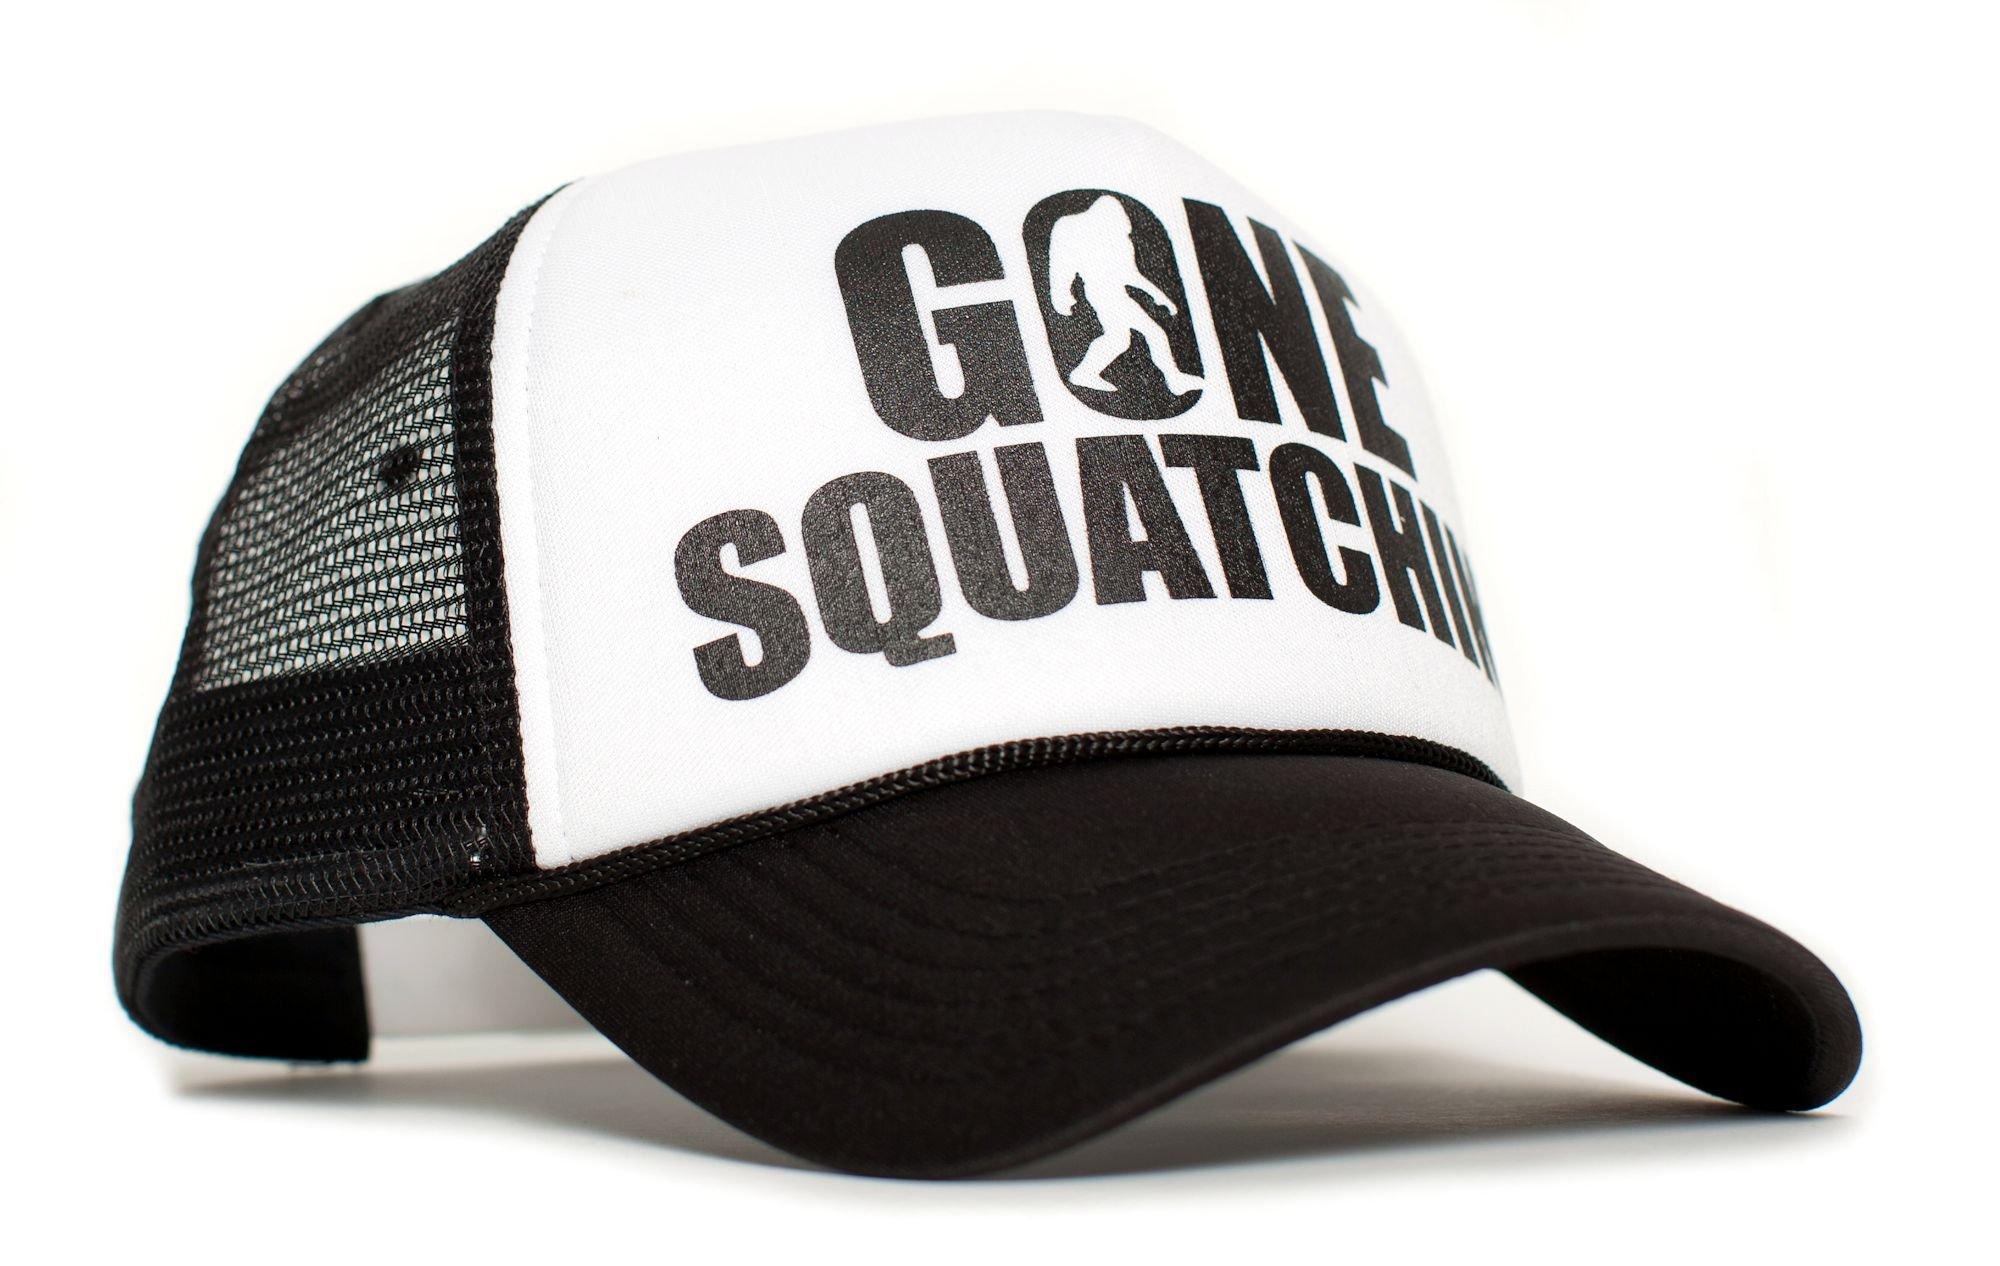 Posse Comitatus Gone Squatchin' Unisex-Adult Trucker Hat -One-Size Black/White